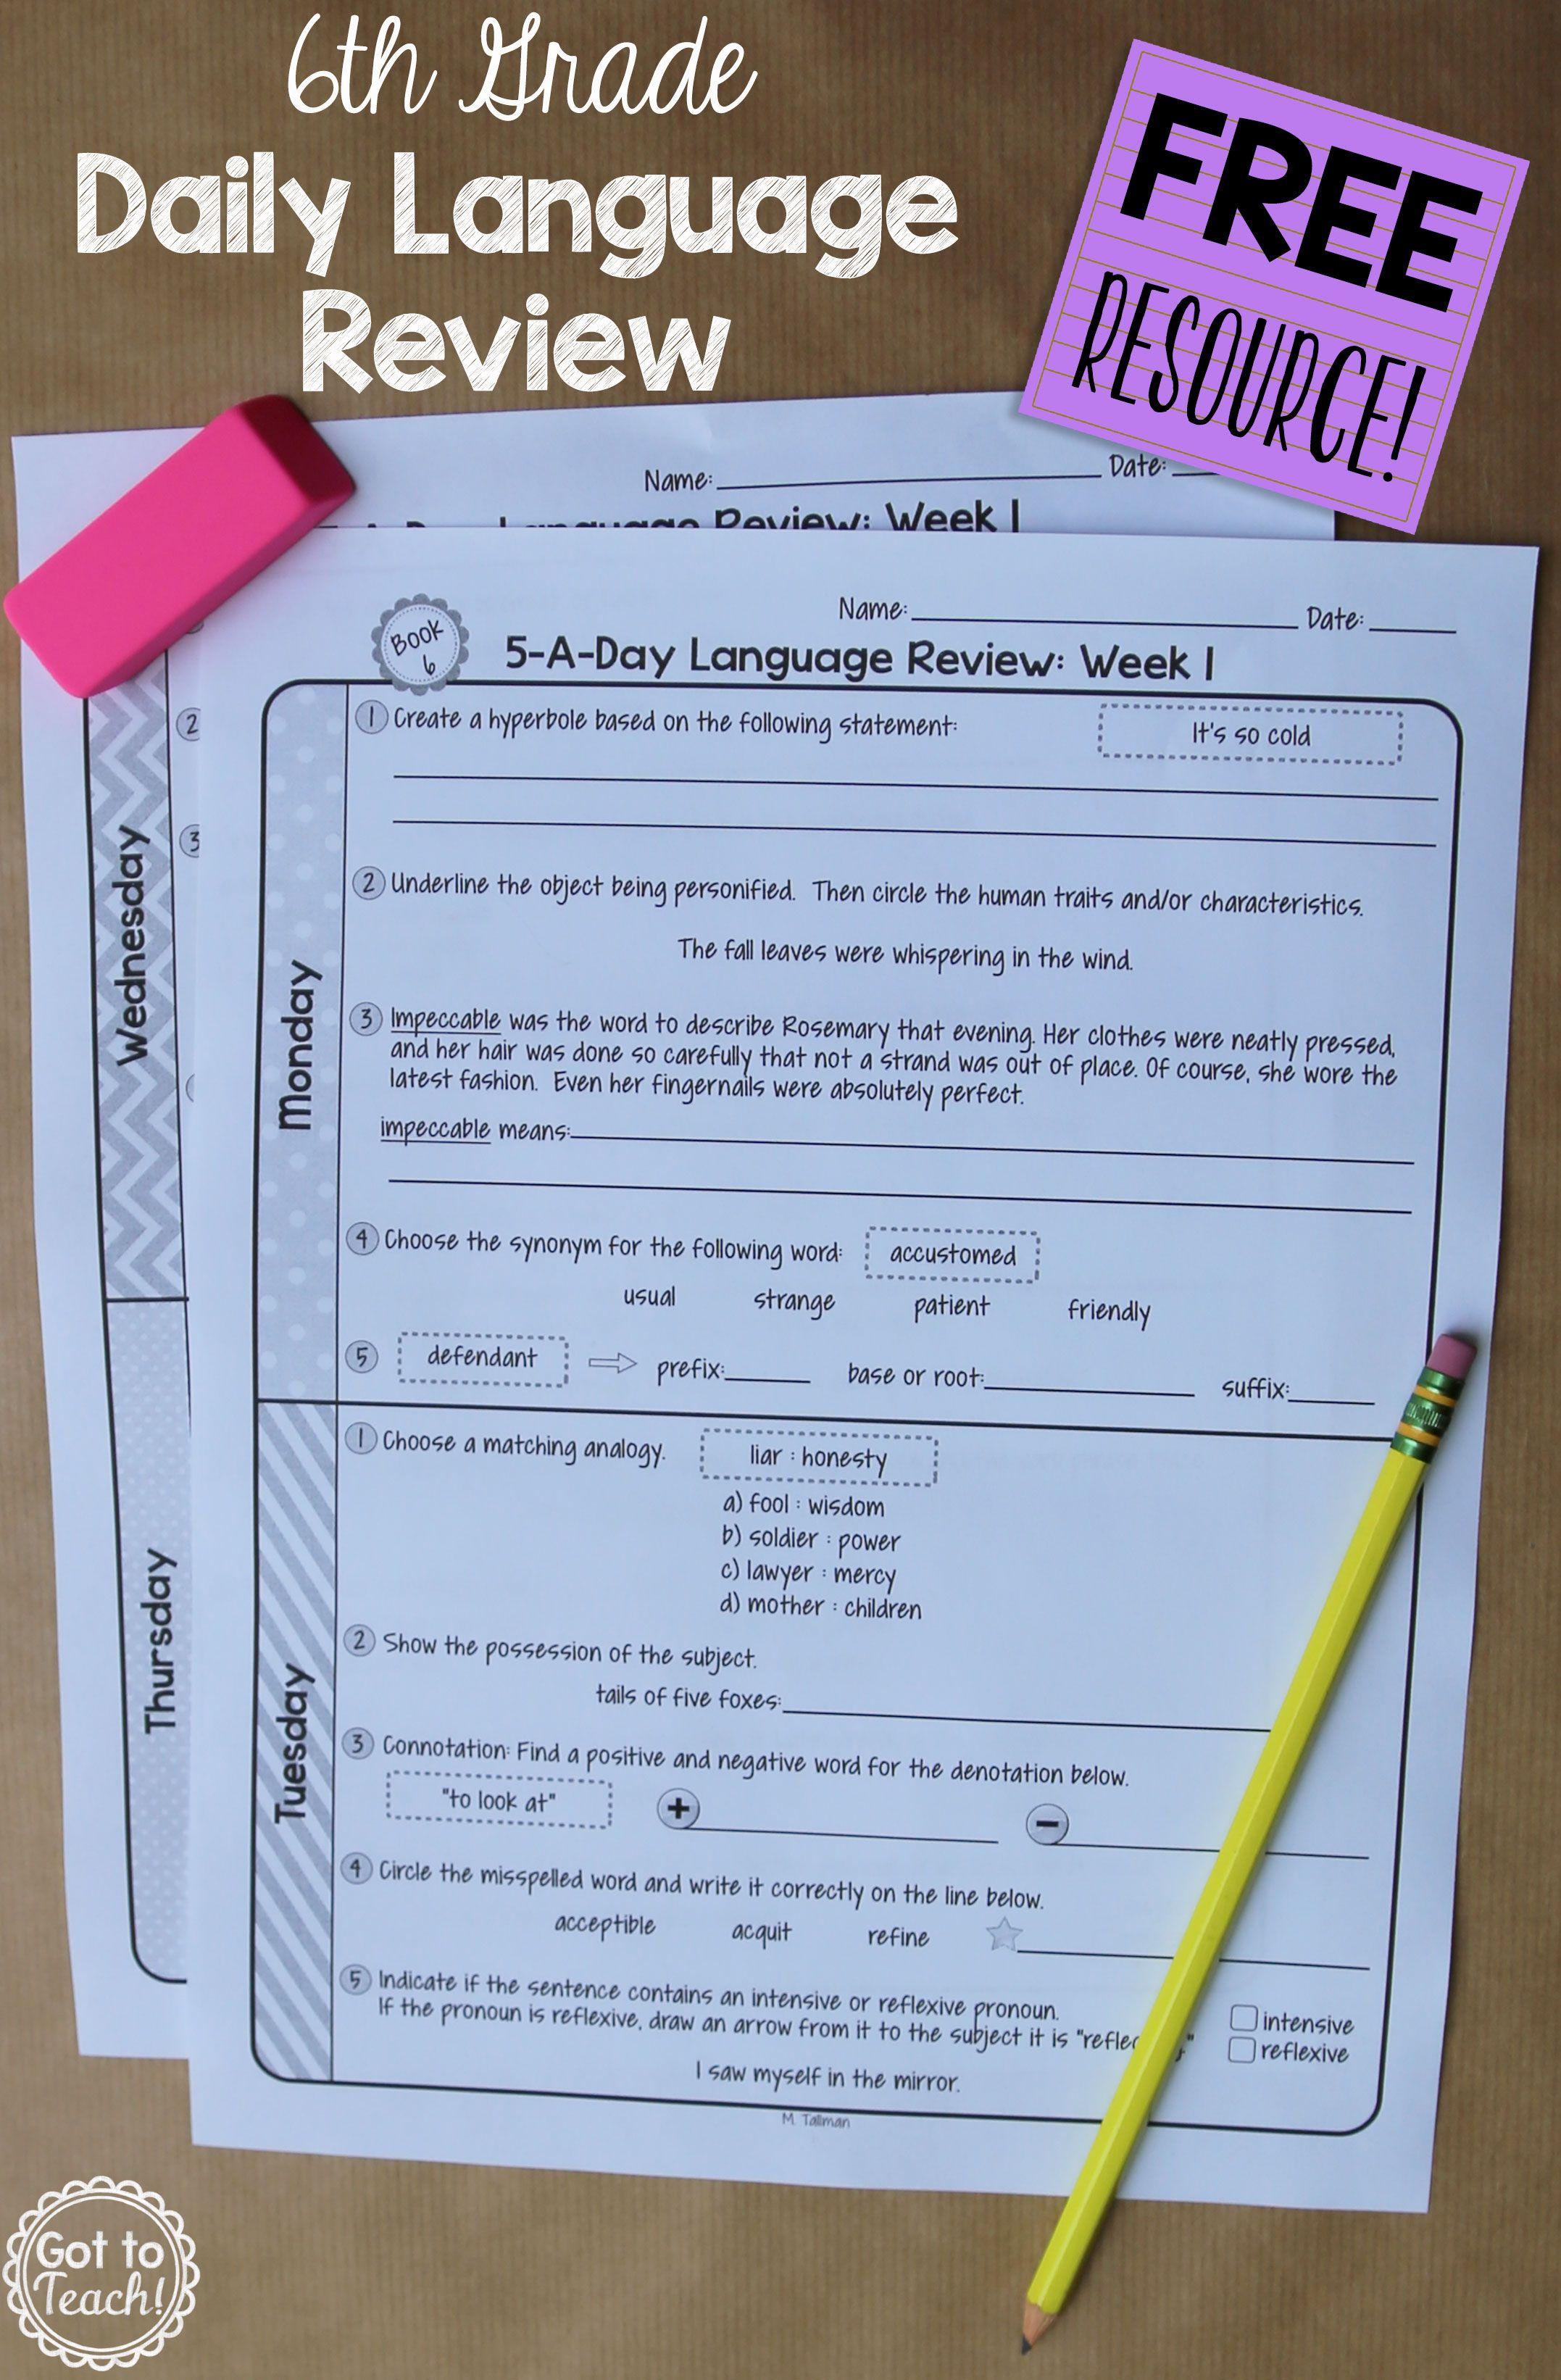 6Th Grade Daily Language Spiral Review - 1 Week Free - Daily Language Review Grade 5 Free Printable